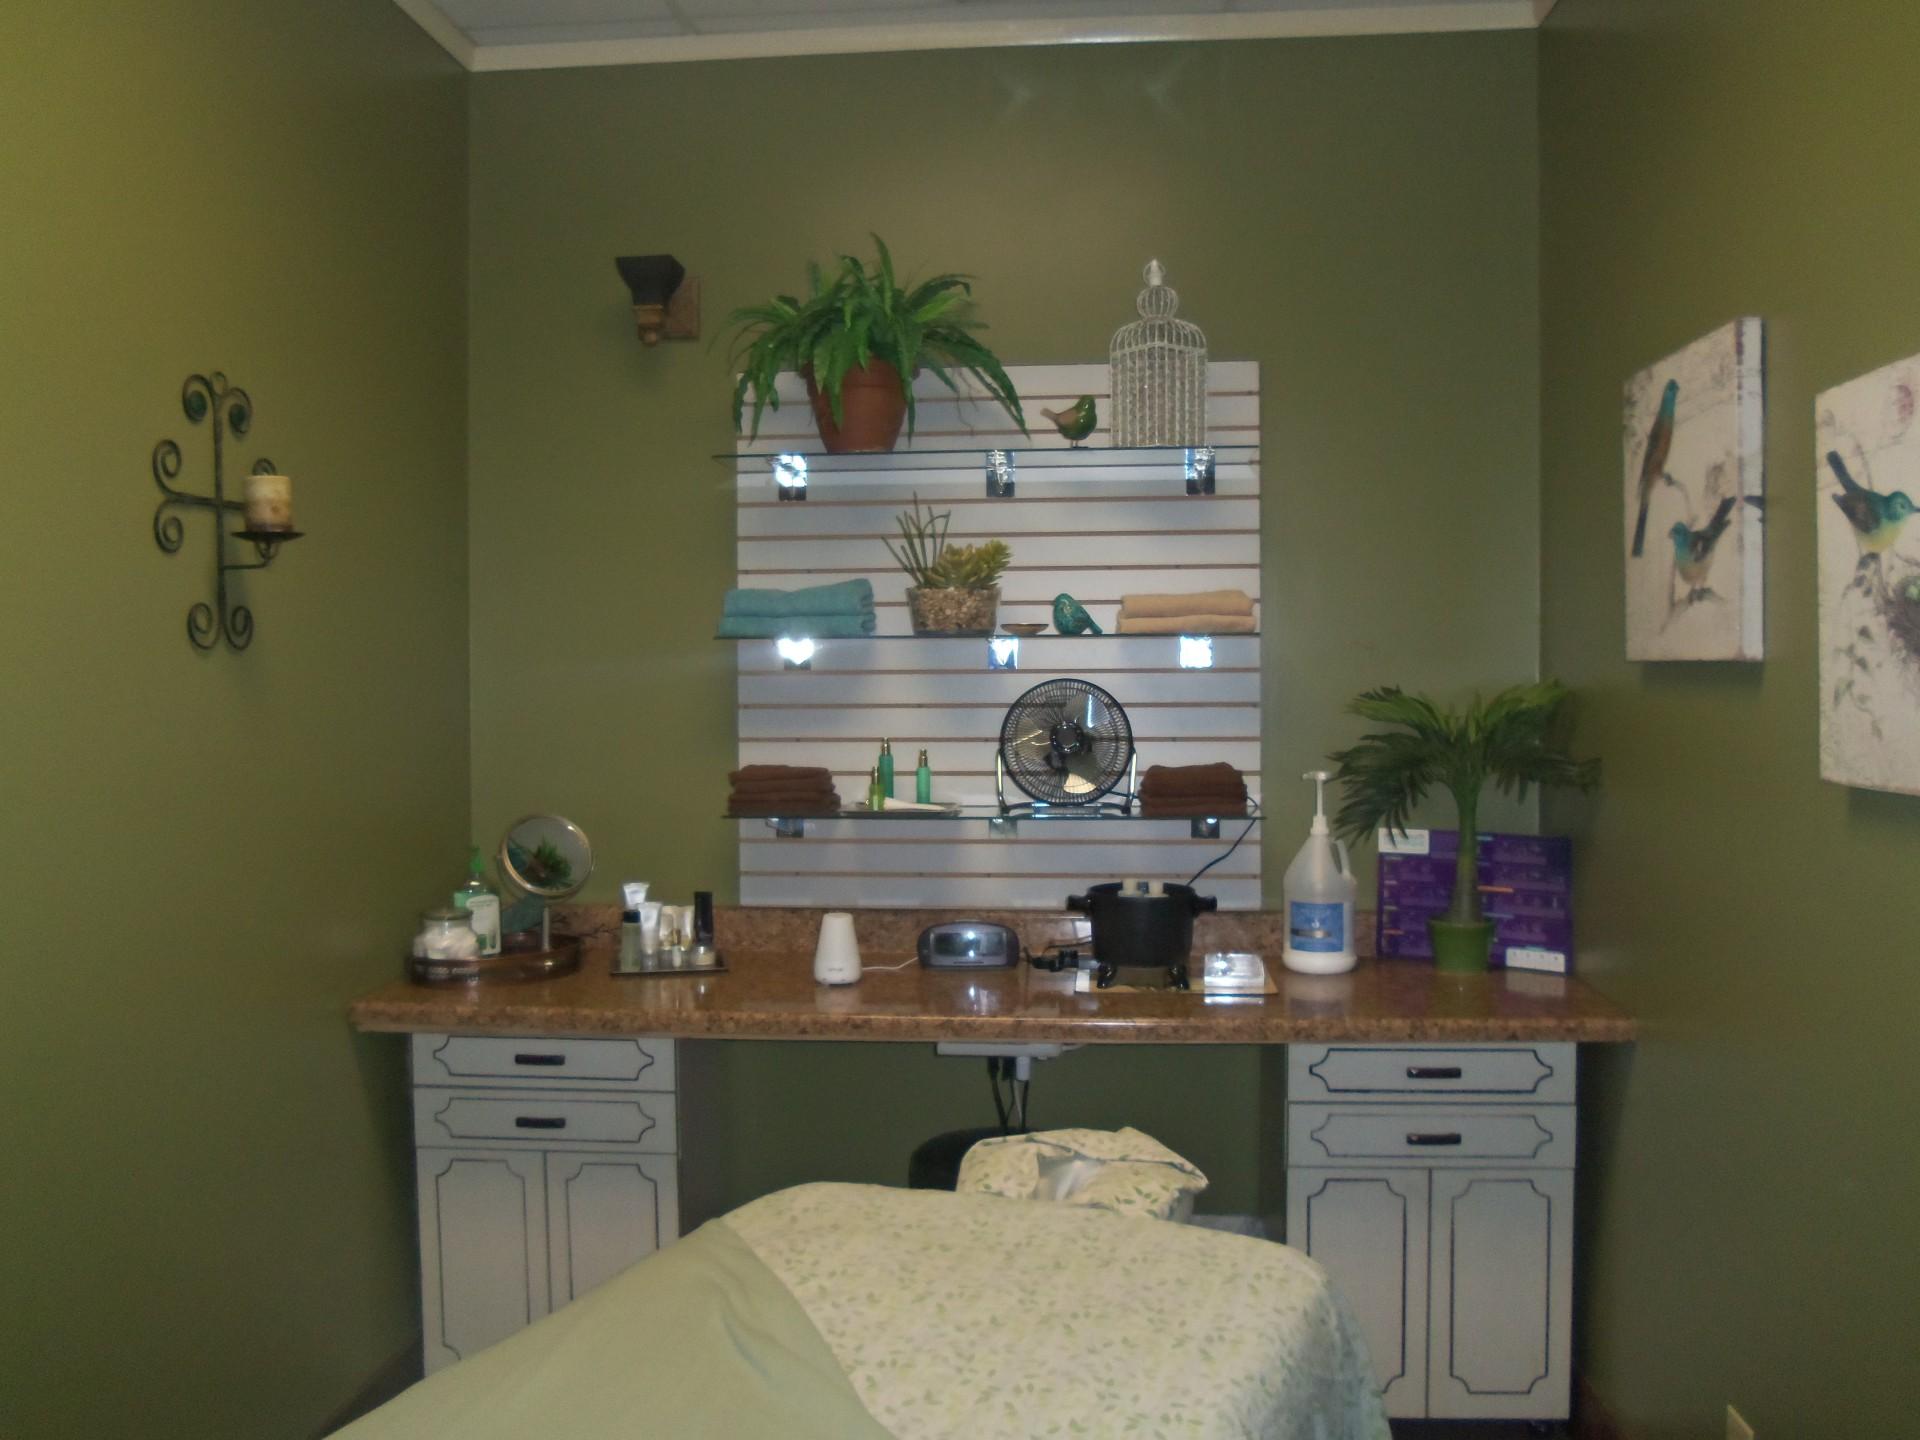 Theraputic massage